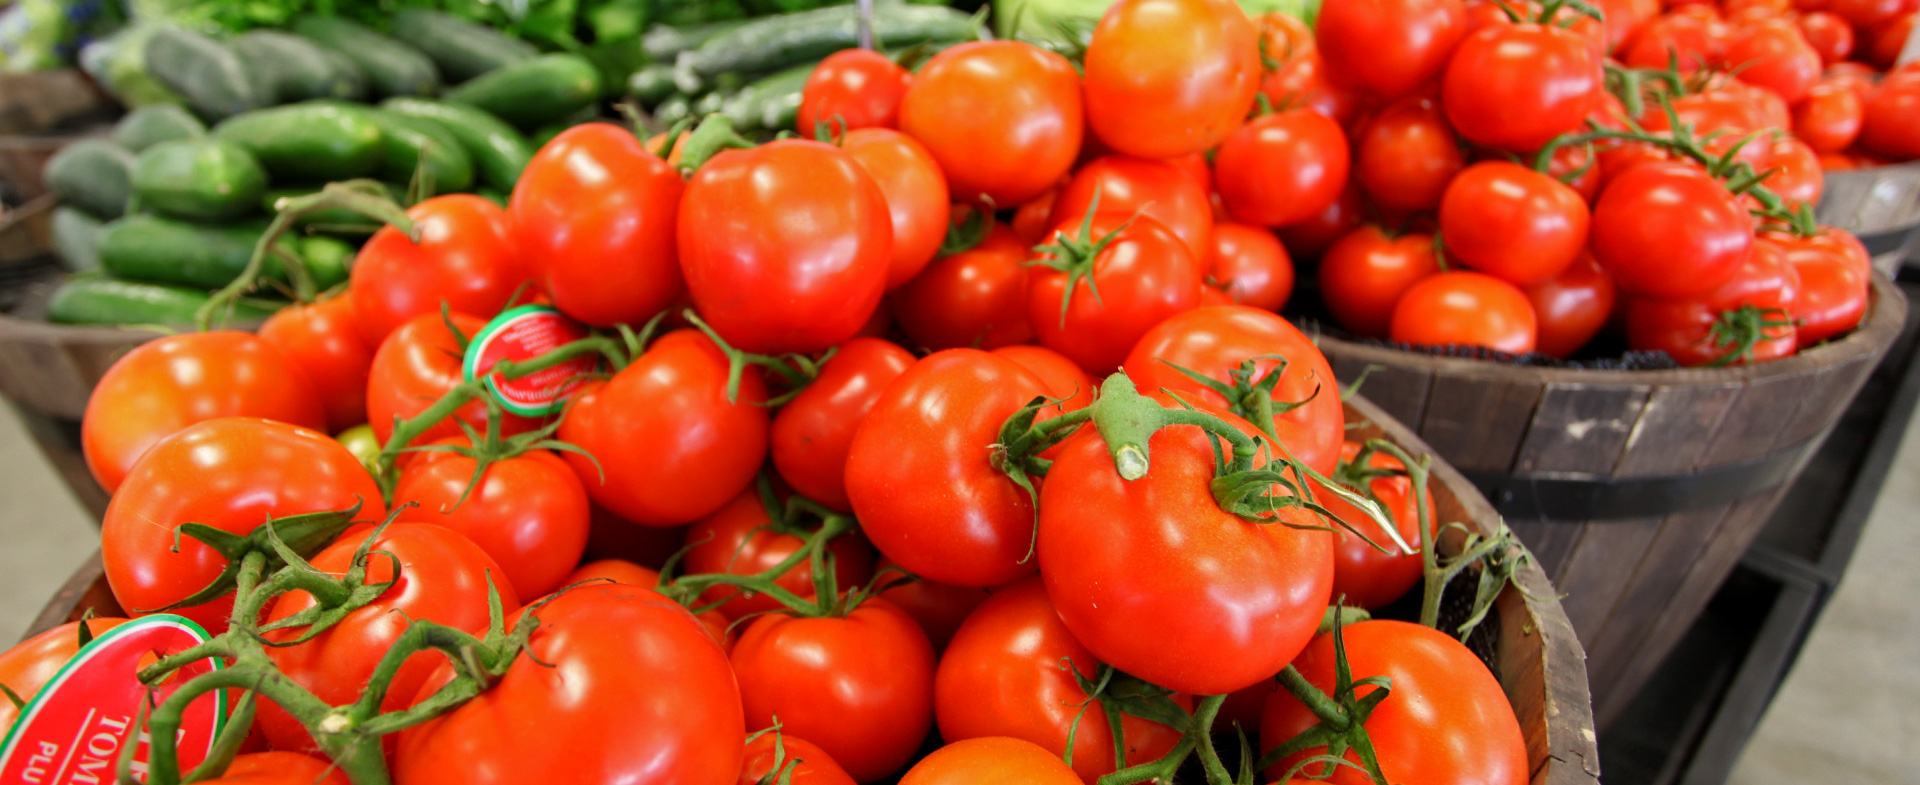 Home-Slider-Tomatoes